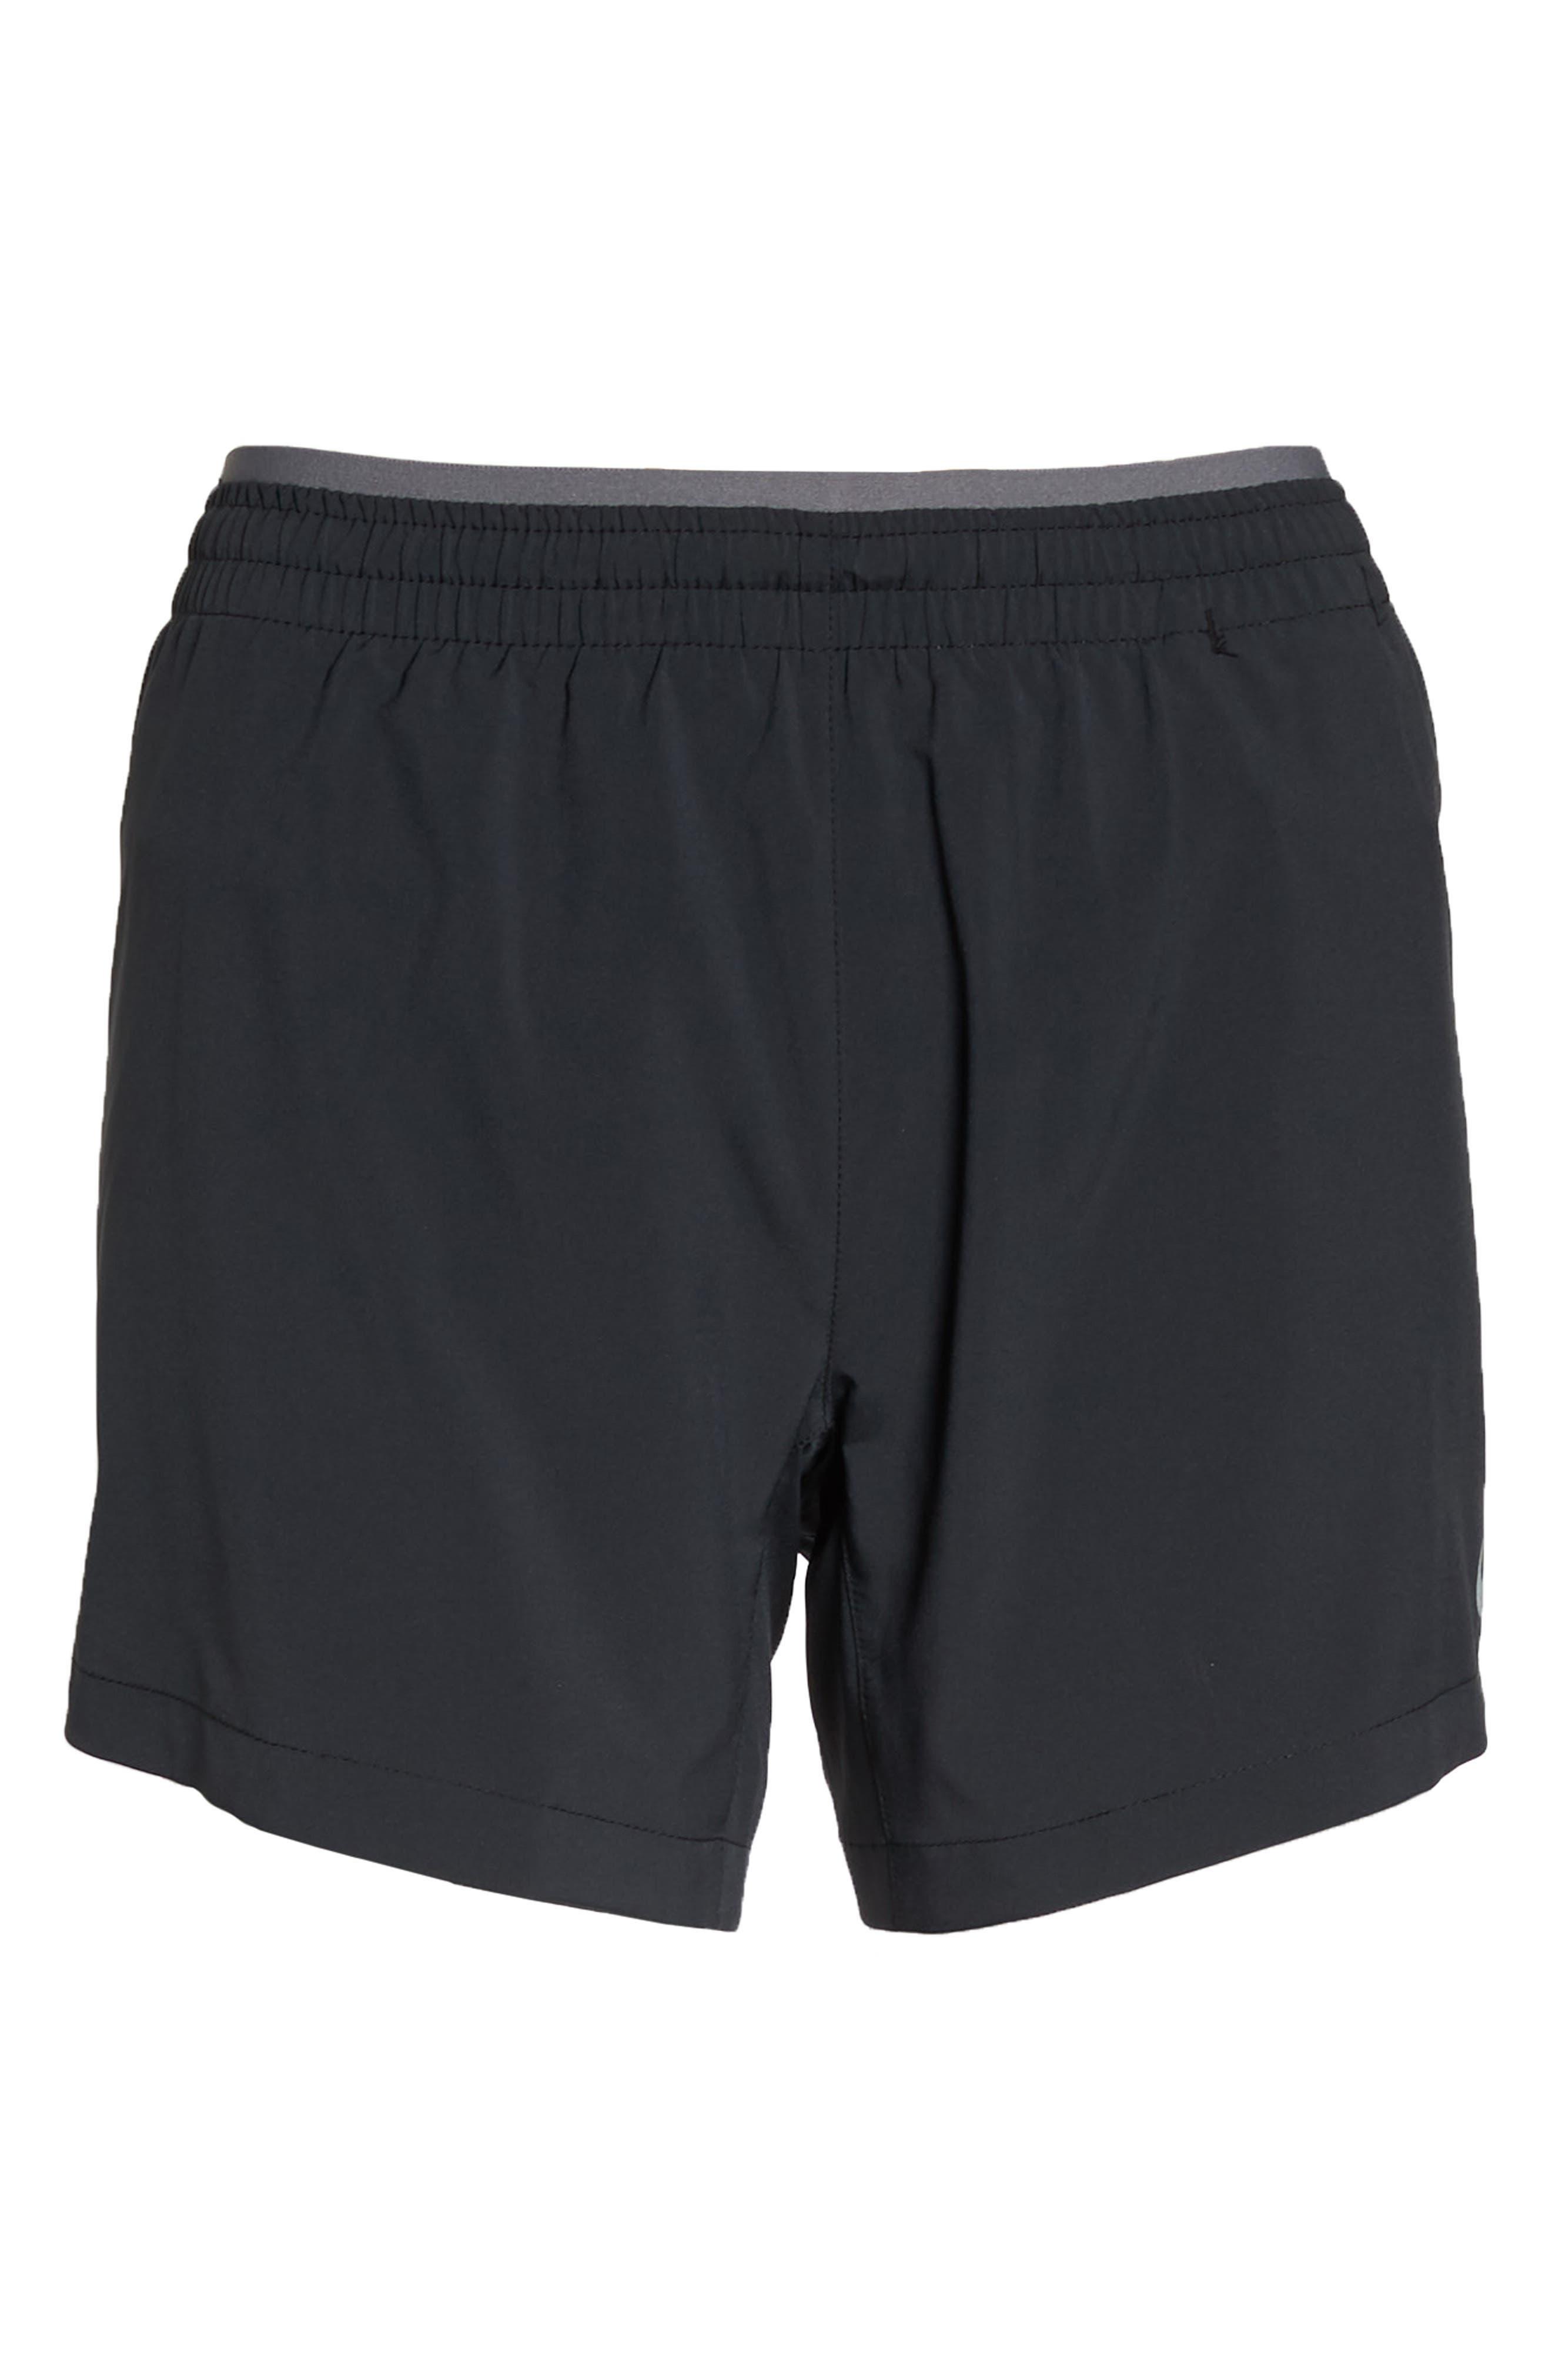 Flex 5-Inch Inseam Running Shorts,                             Alternate thumbnail 7, color,                             BLACK/ GUNSMOKE